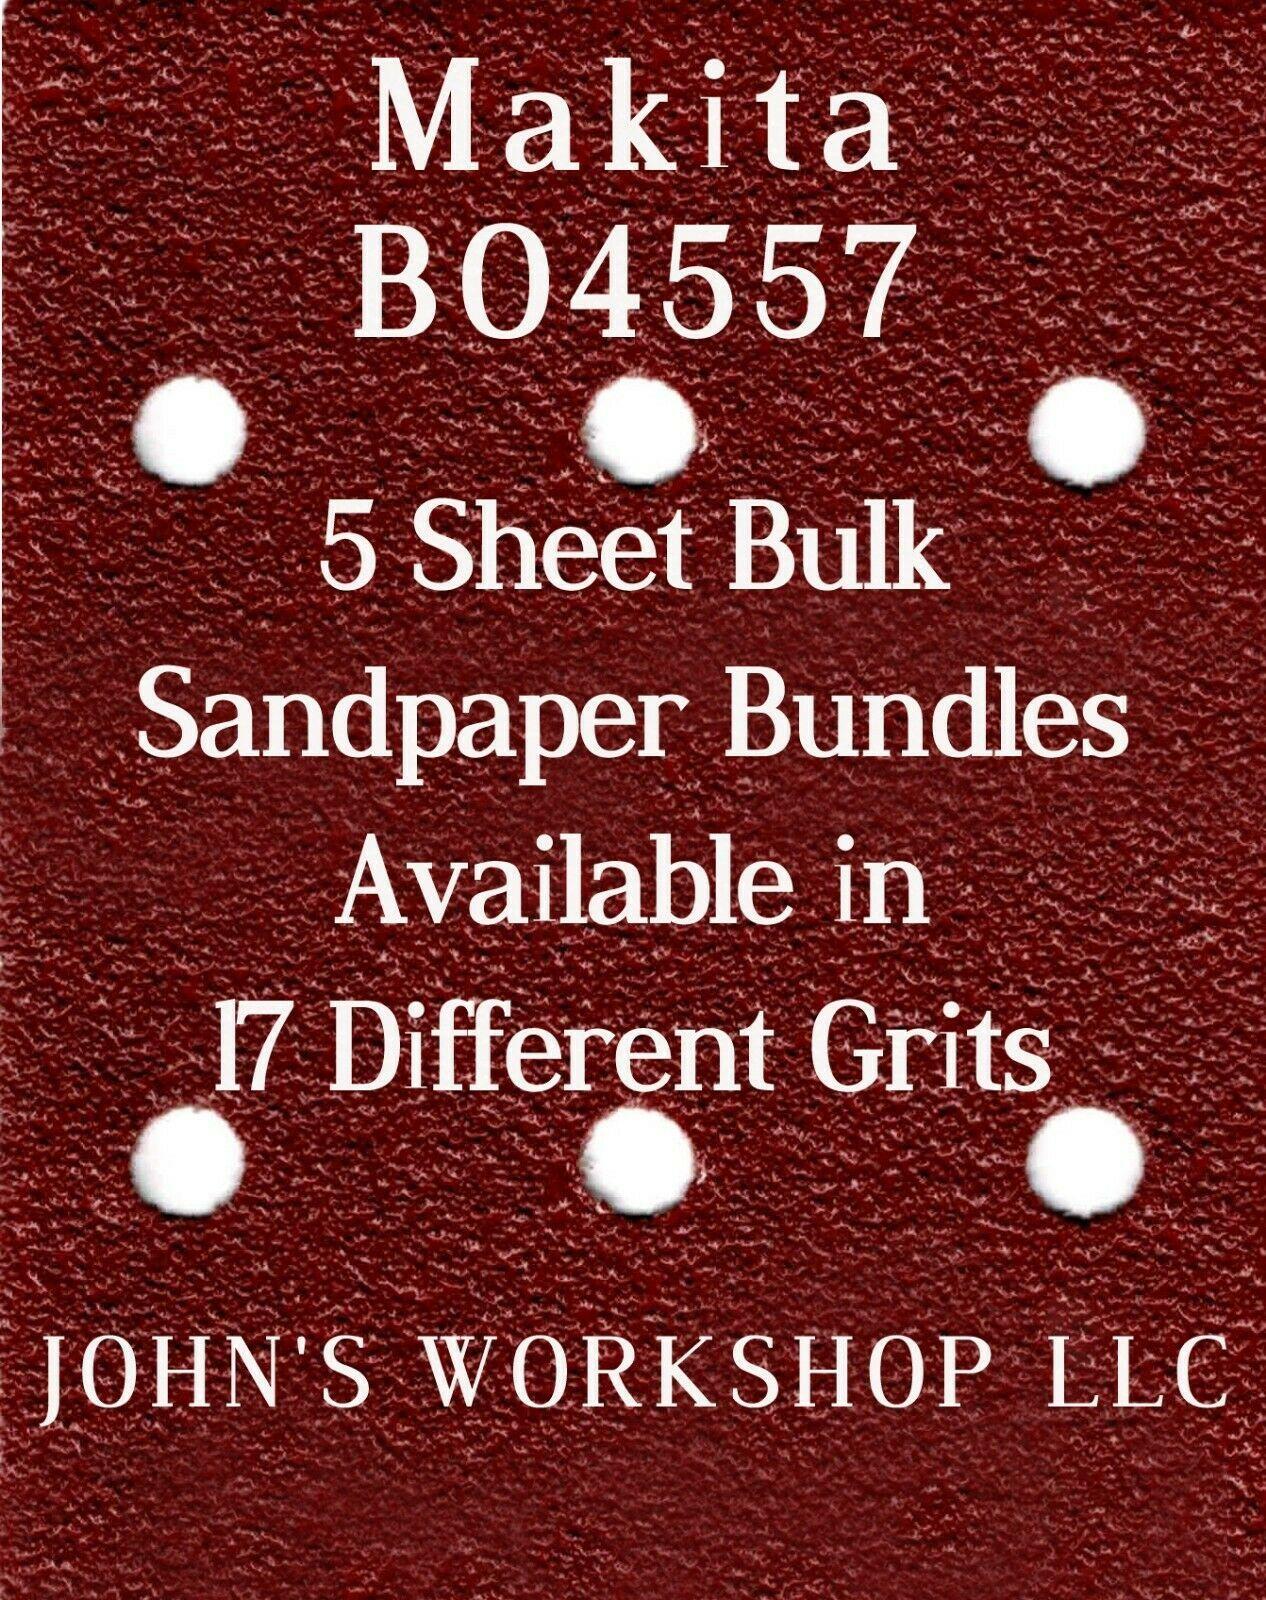 Makita BO4557 - 1/4 Sheet - 17 Grits - No-Slip - 5 Sandpaper Bulk Bundles - $7.14